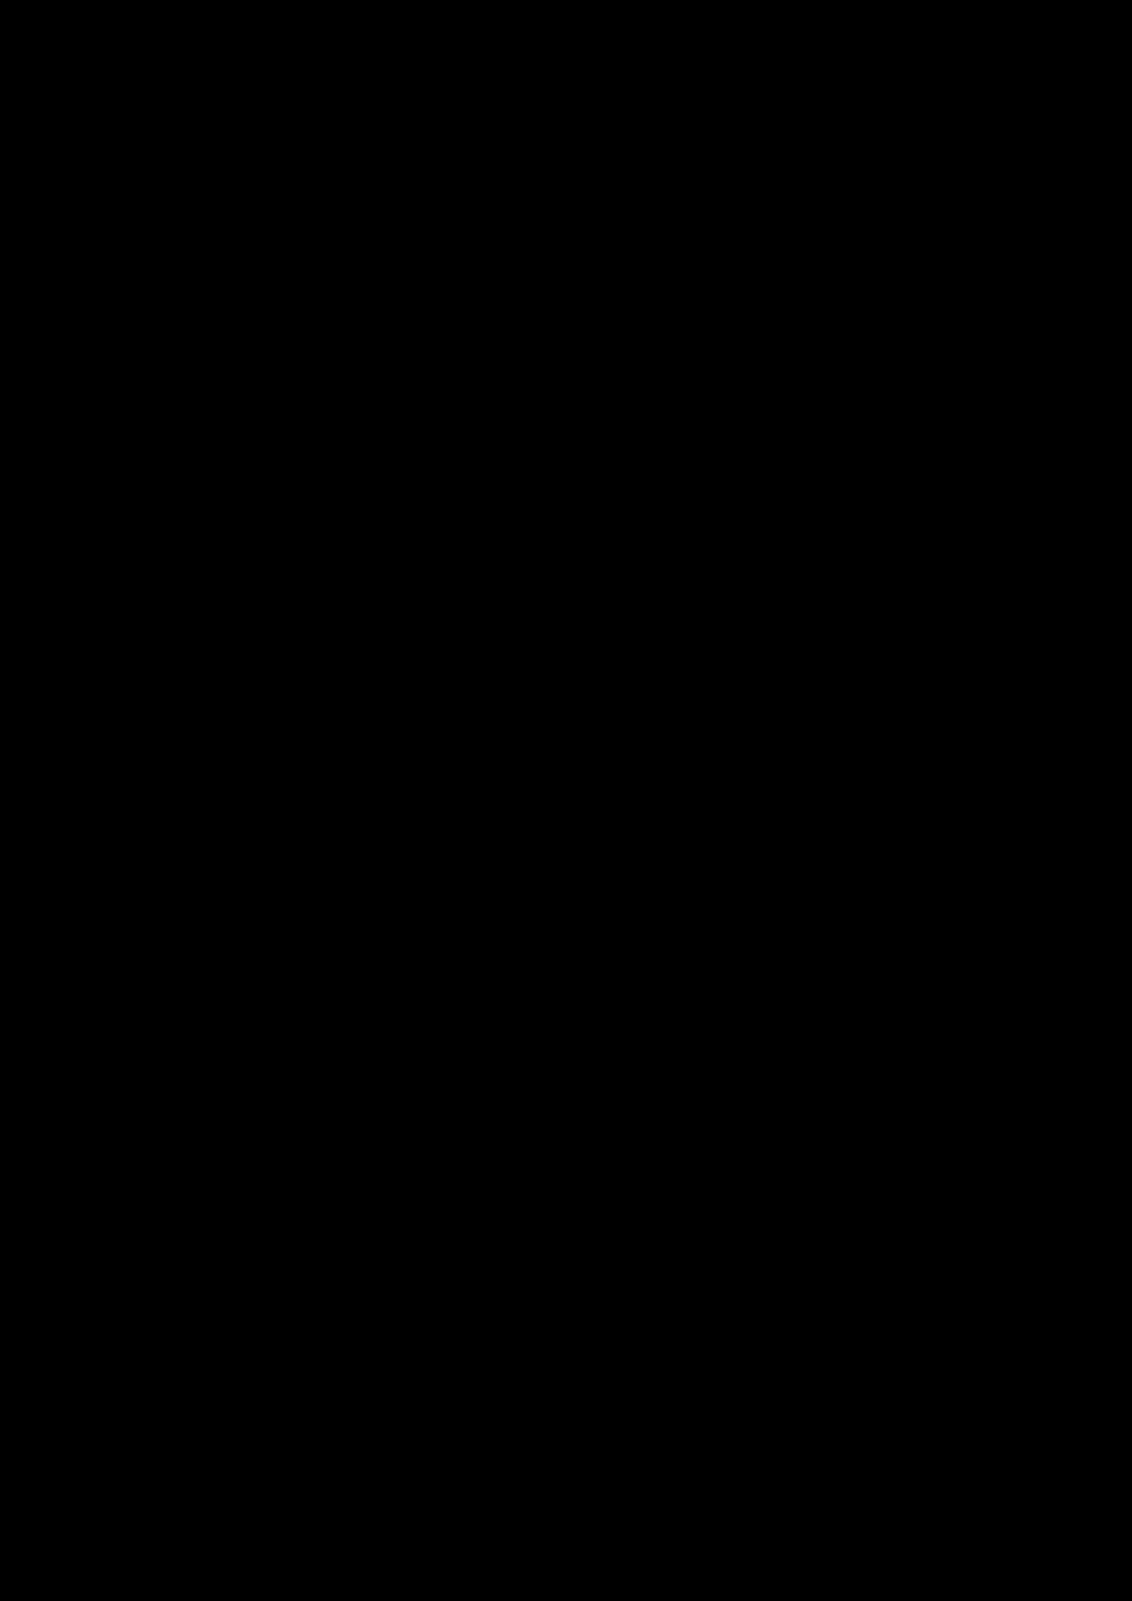 Korolevstvo slez slide, Image 74